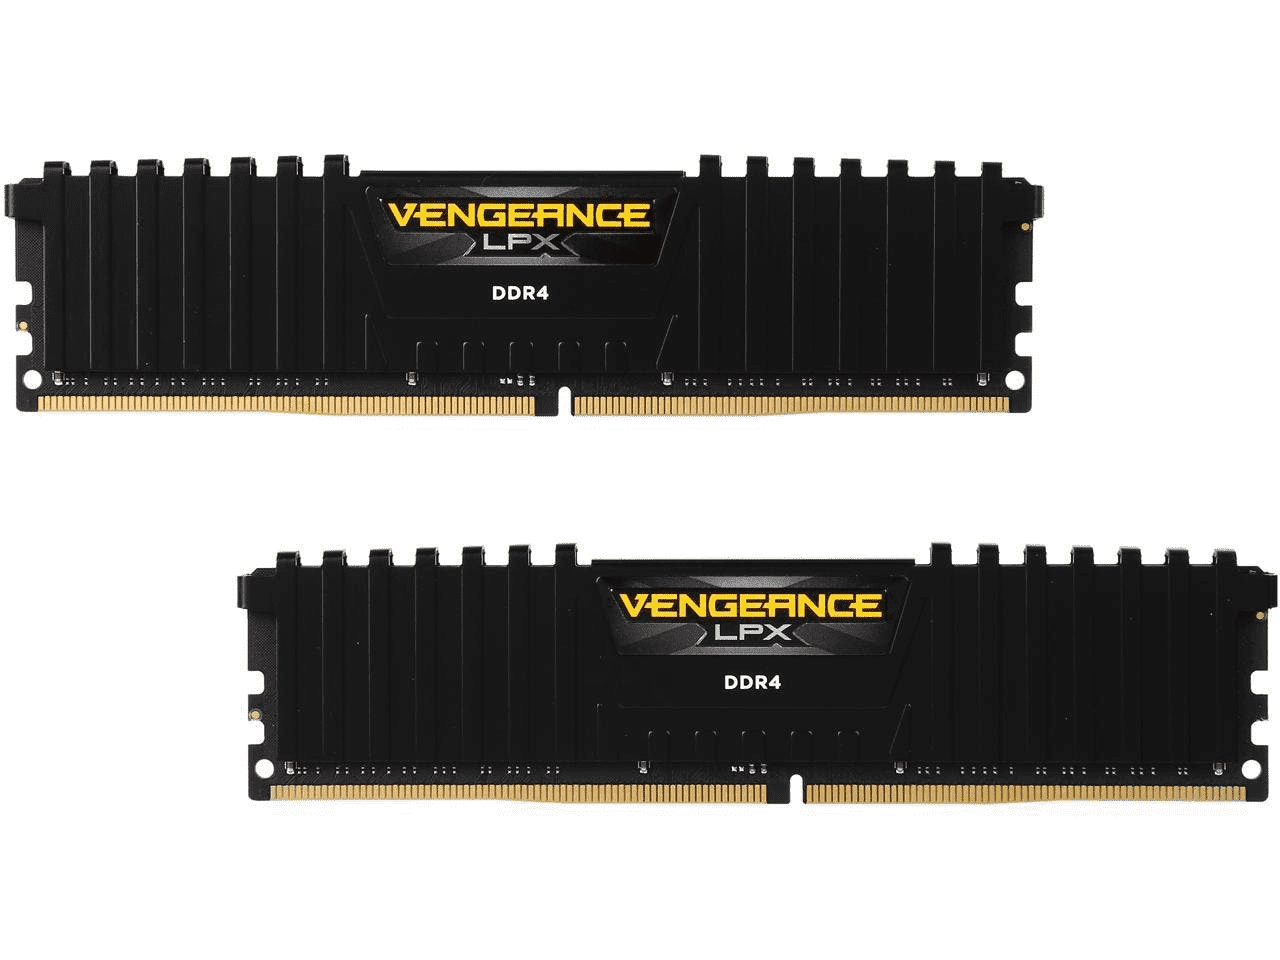 Corsair Vengeance LPX 32GB (2x16GB) DDR4 3600MHz C18 2 UDIMM Anodized Aluminum Black Heat Spreader